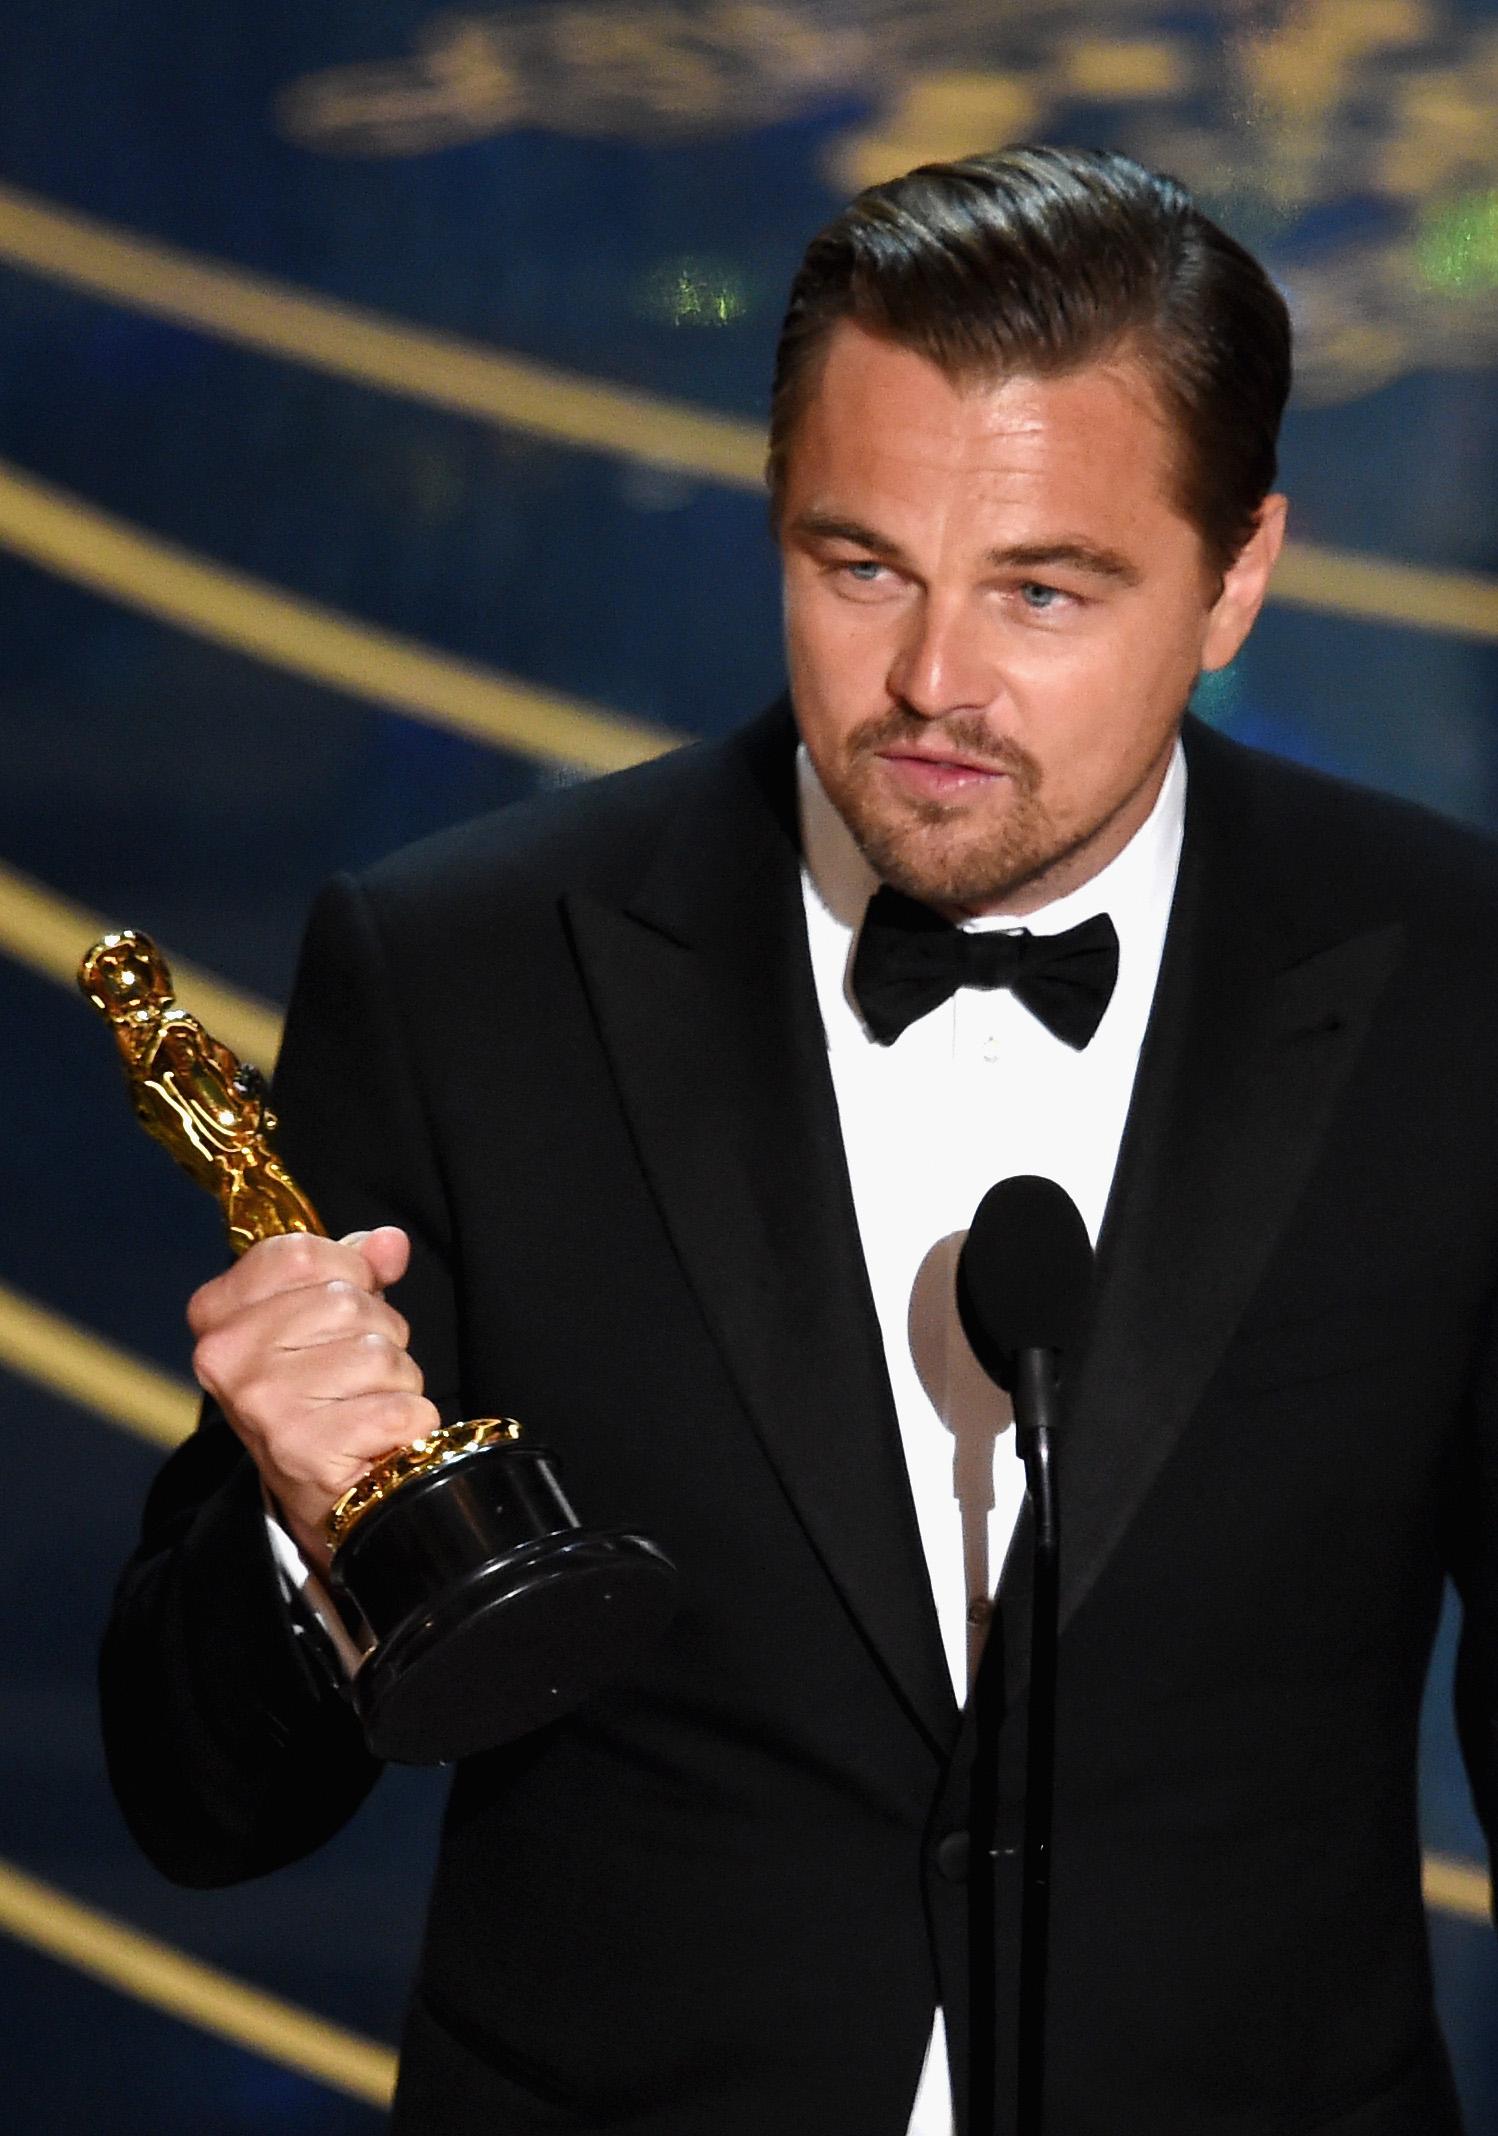 He finally waited: Leonardo DiCaprio was awarded the Oscar for best actor 29.02.2016 55